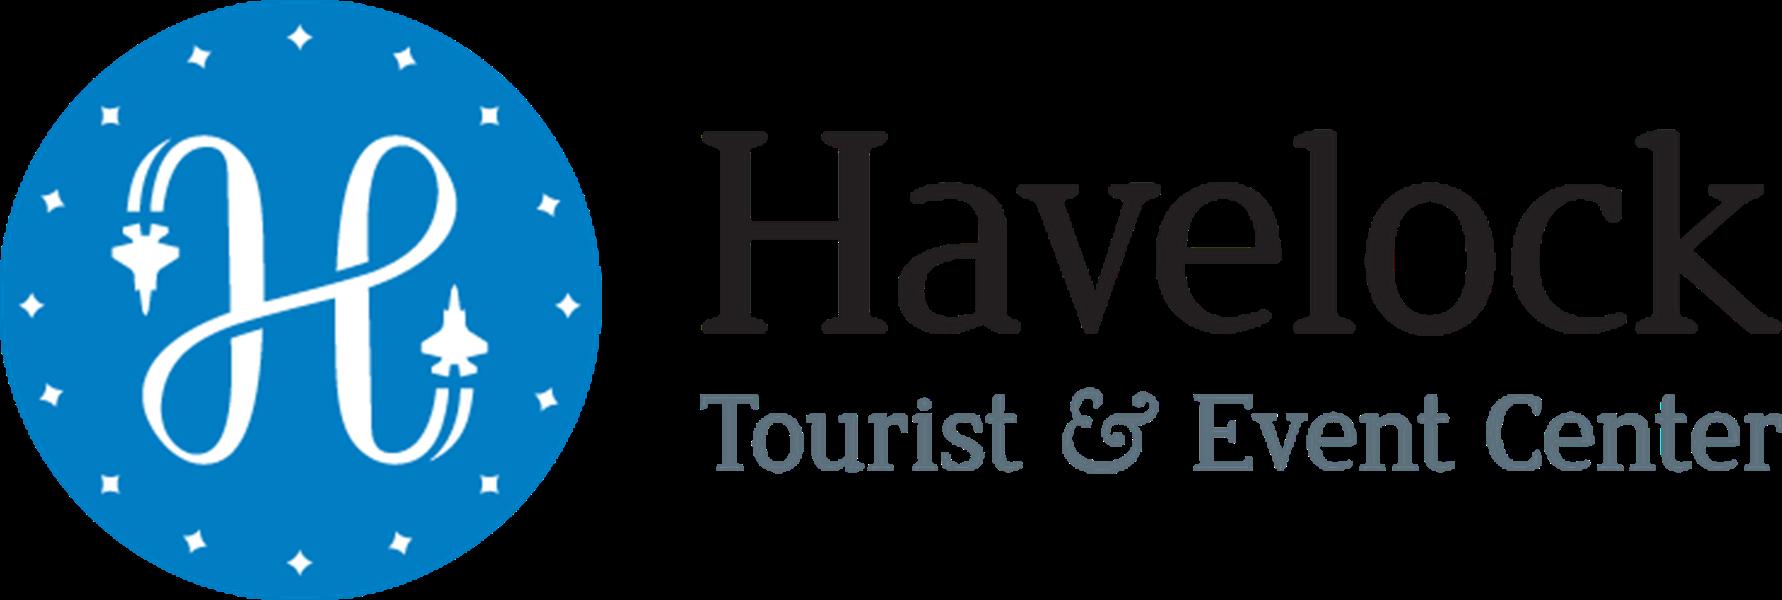 Havelock Tourist & Event Center